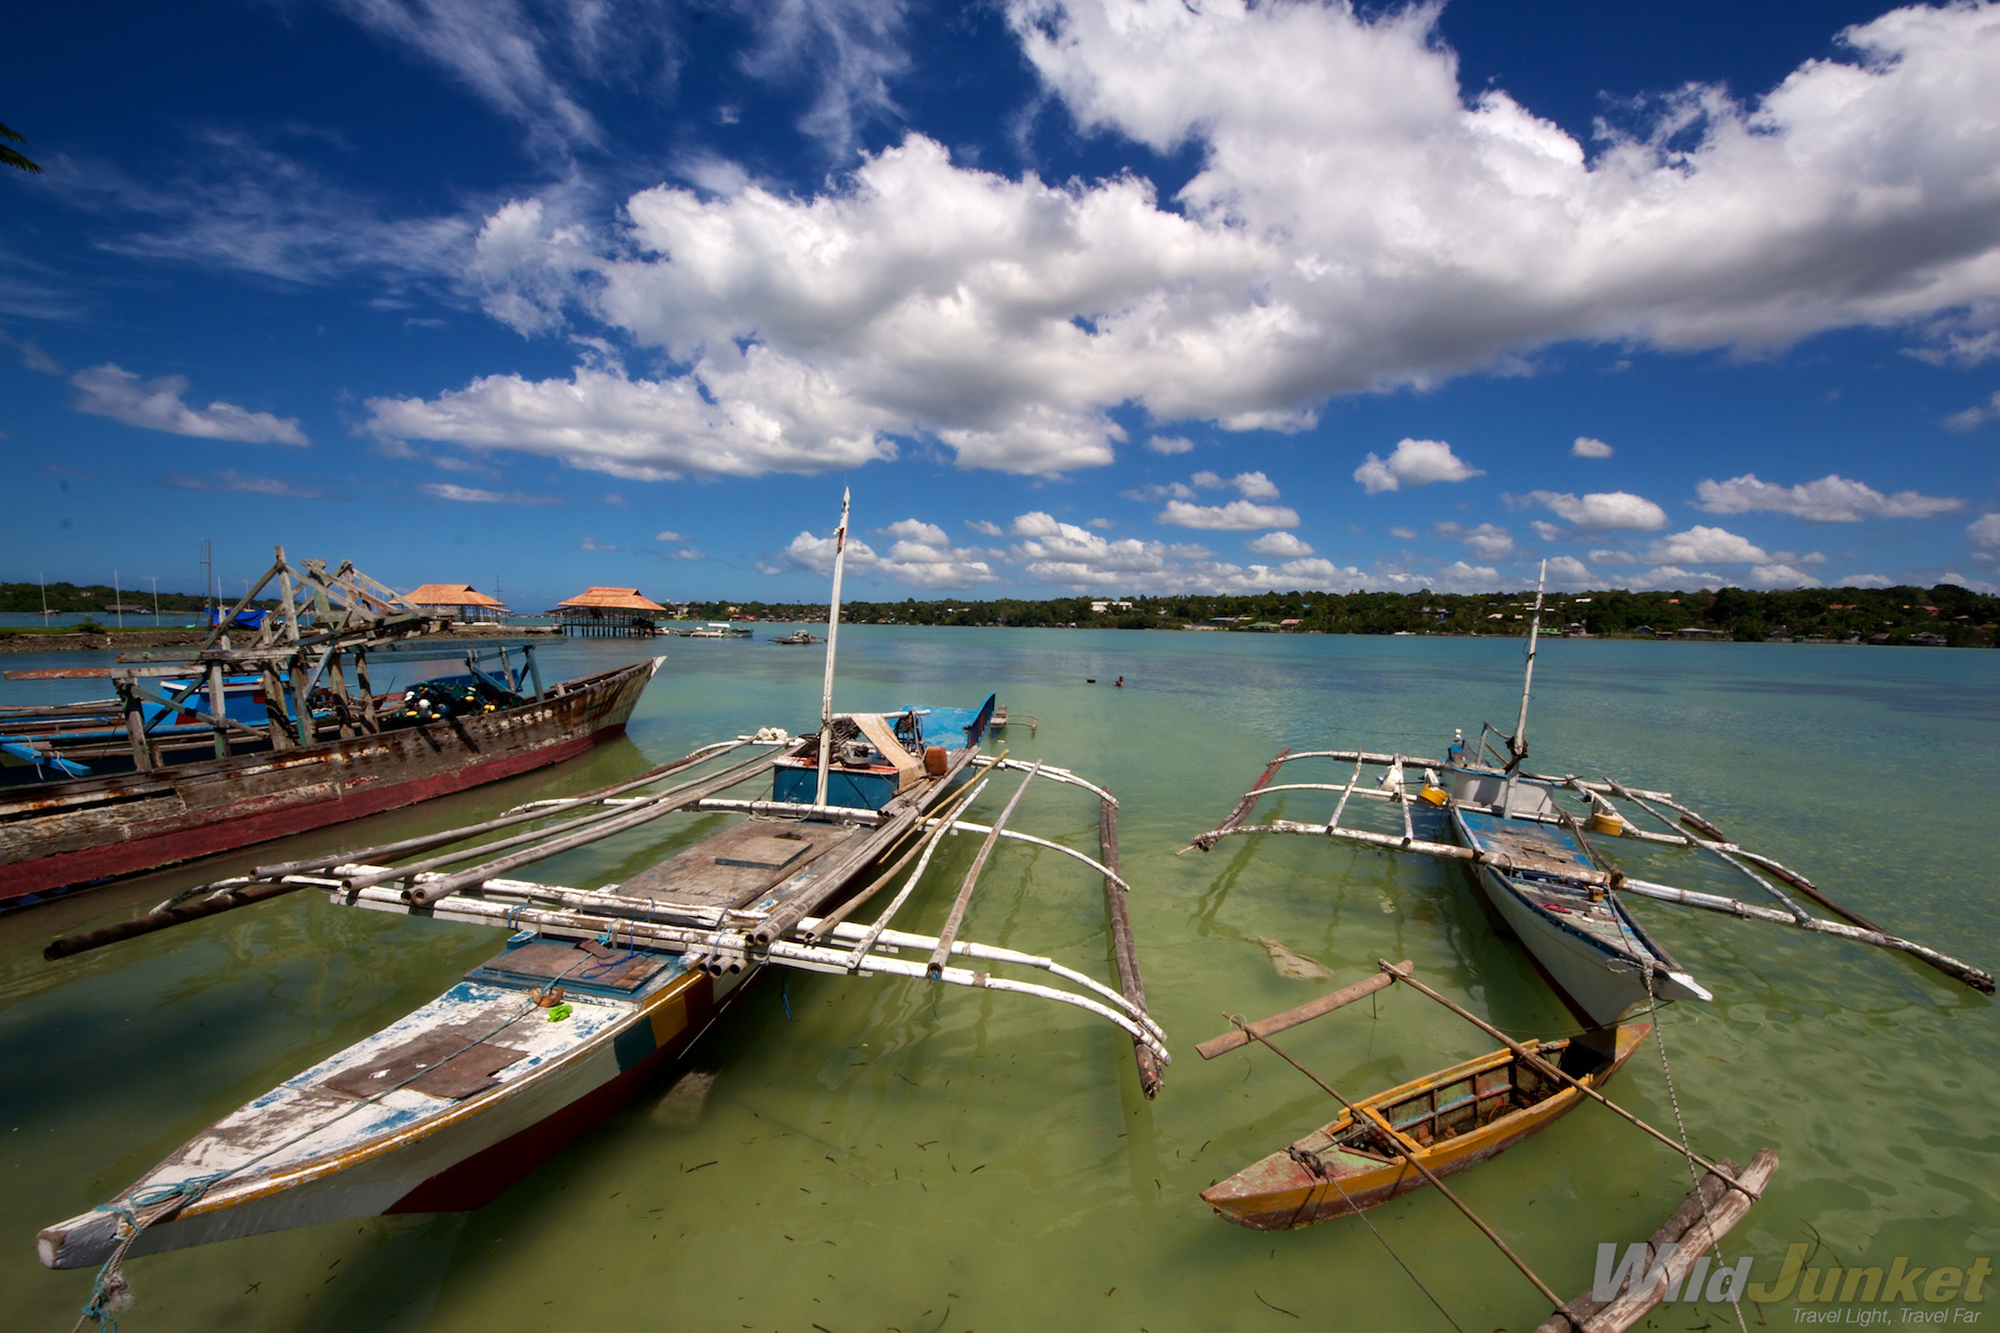 Fishing boats in Bohol.